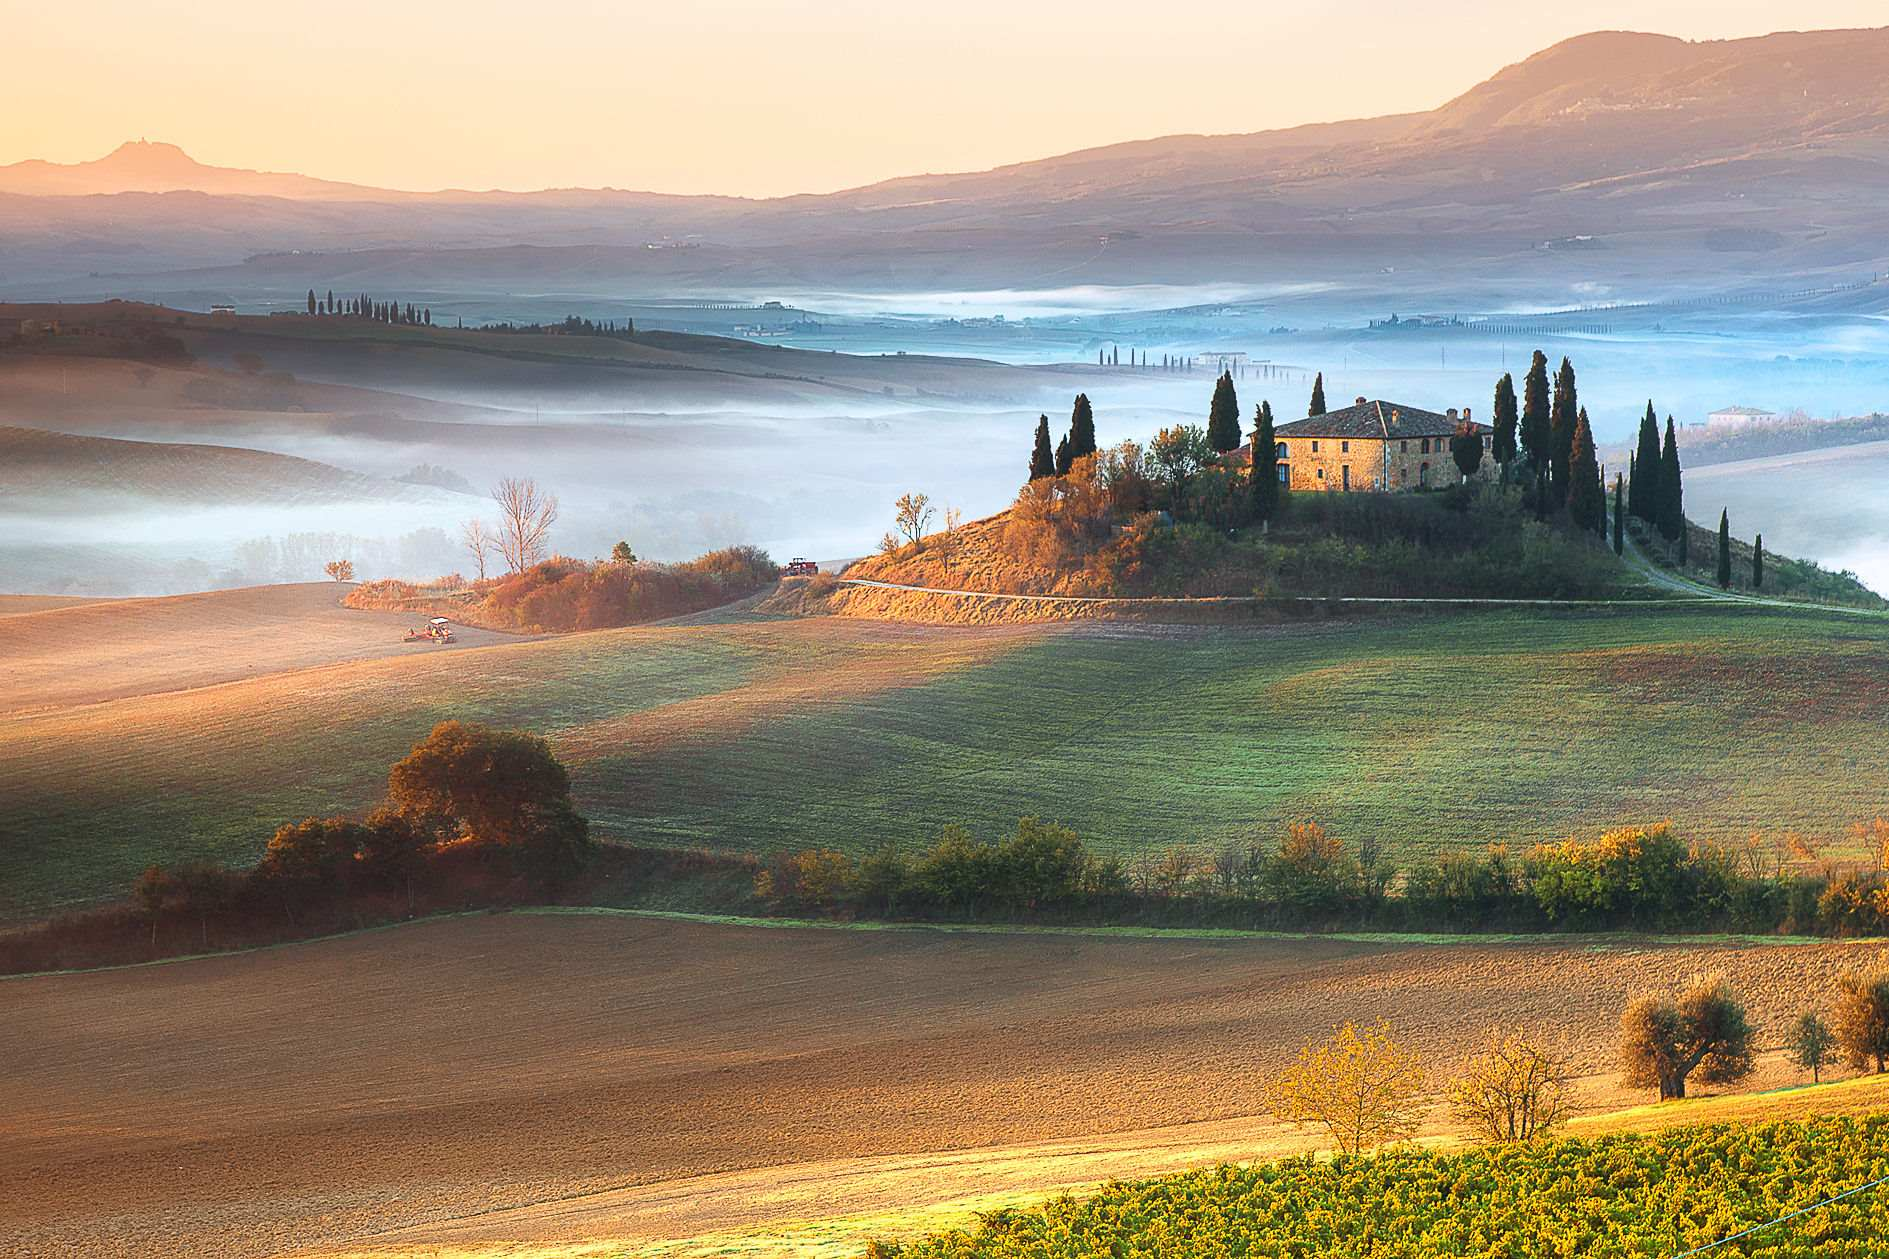 Beautiful Landscape Photography by Adnan Bubalo